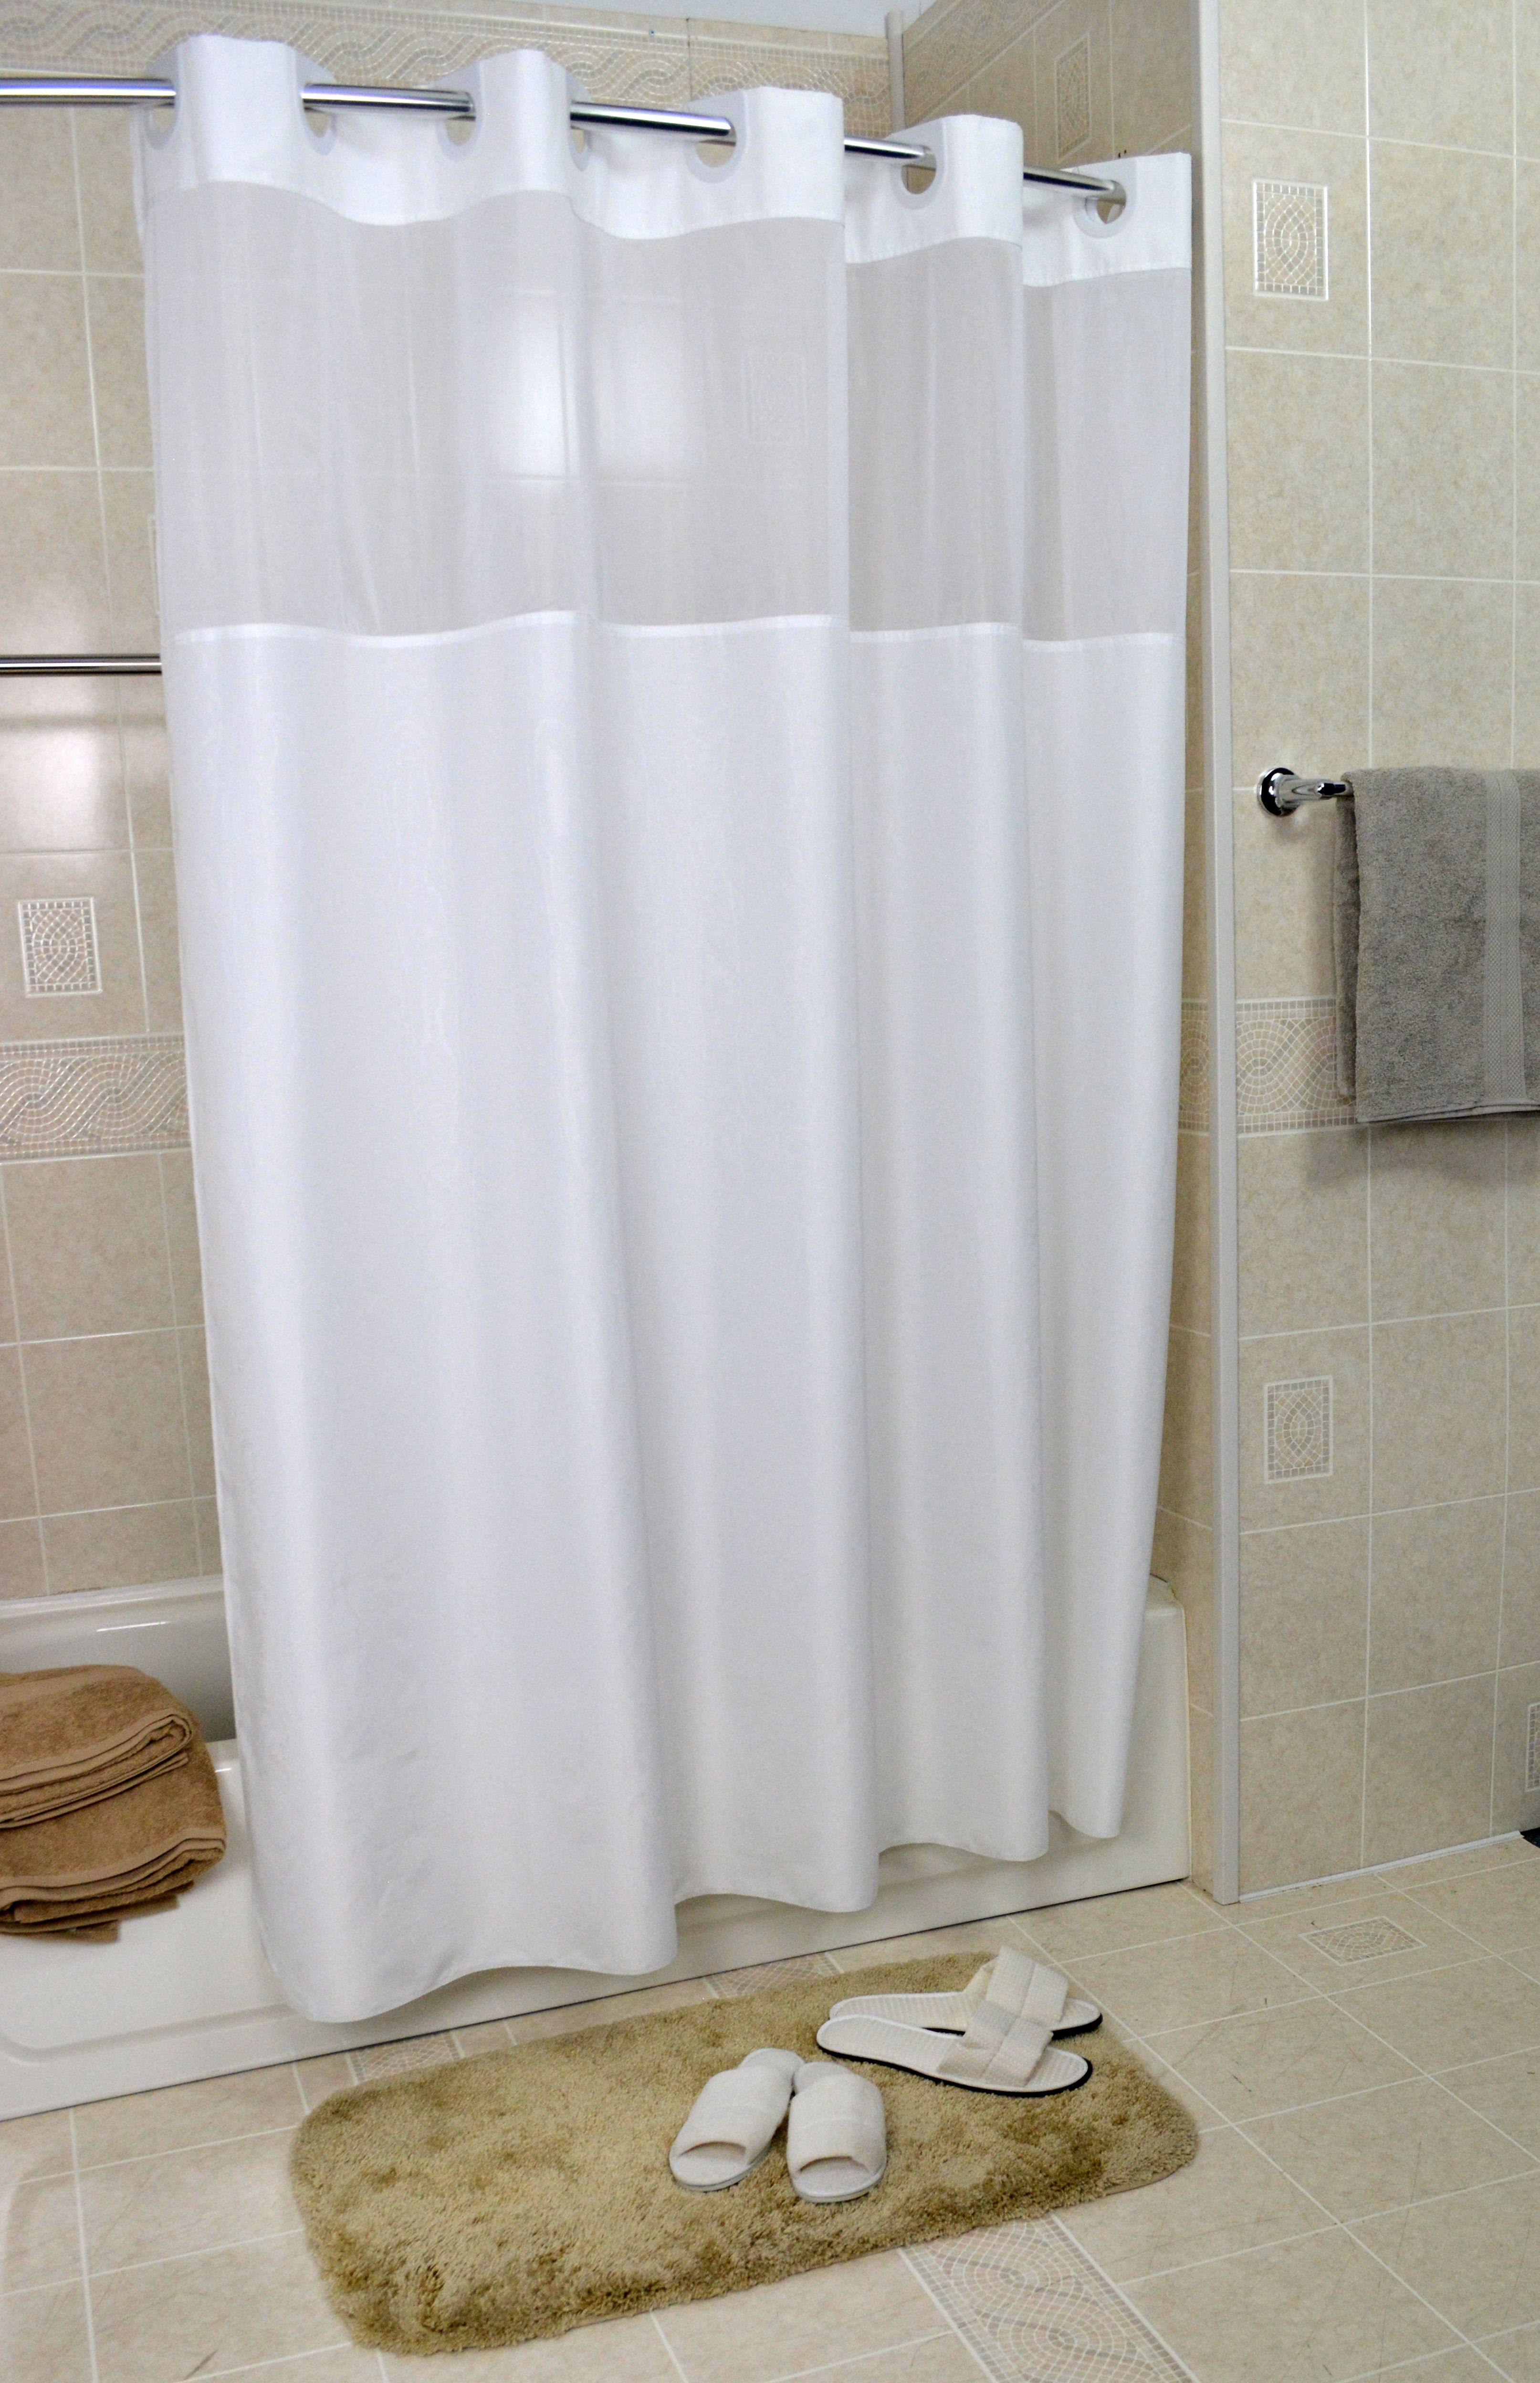 13 Suggestions How To Hang Shower Curtain Should Be Dengan Gambar